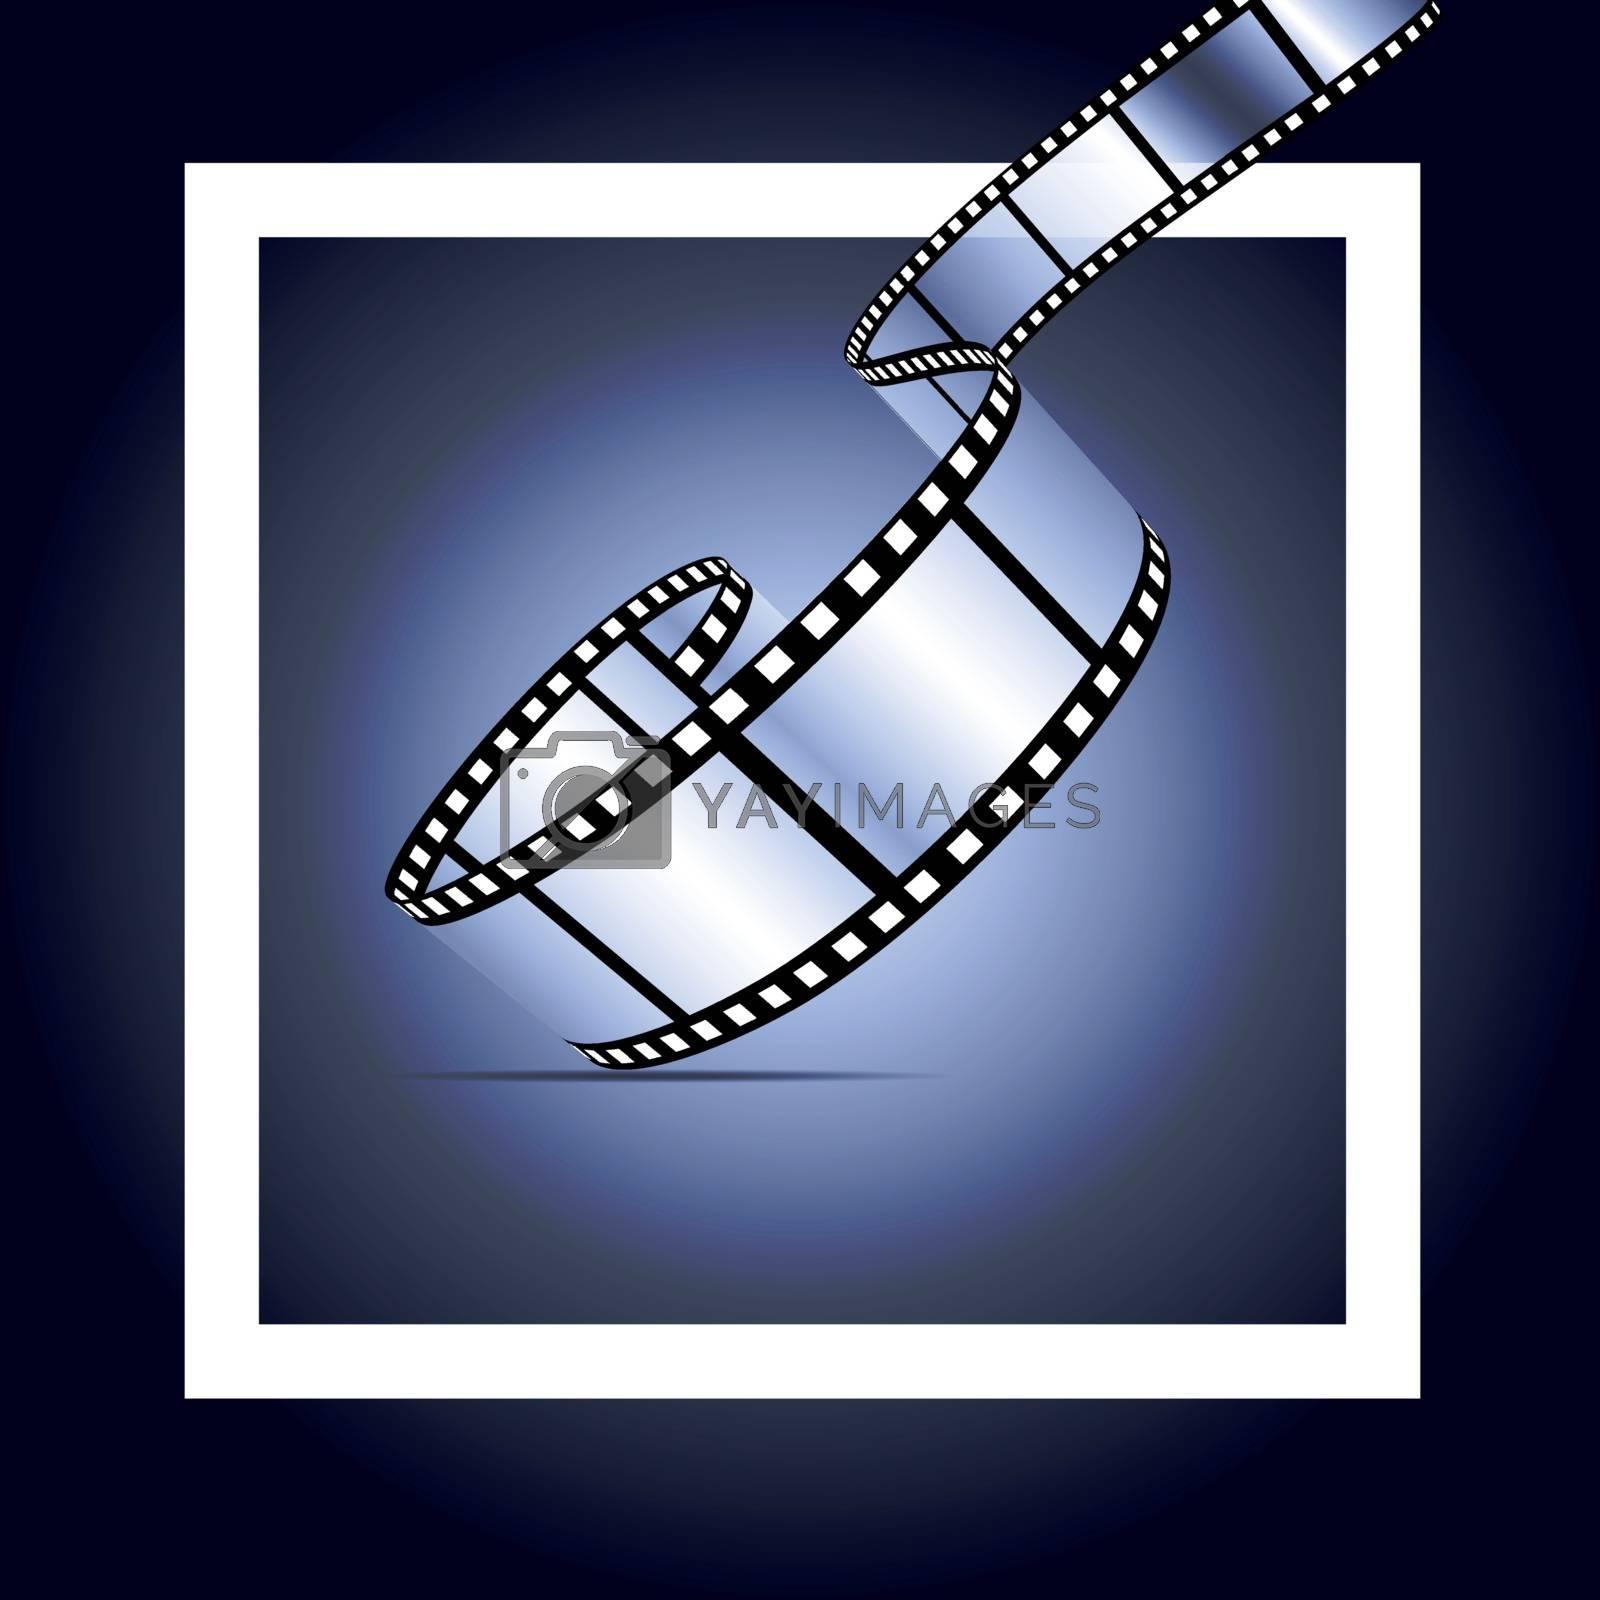 Royalty free image of Film strip background by sermax55